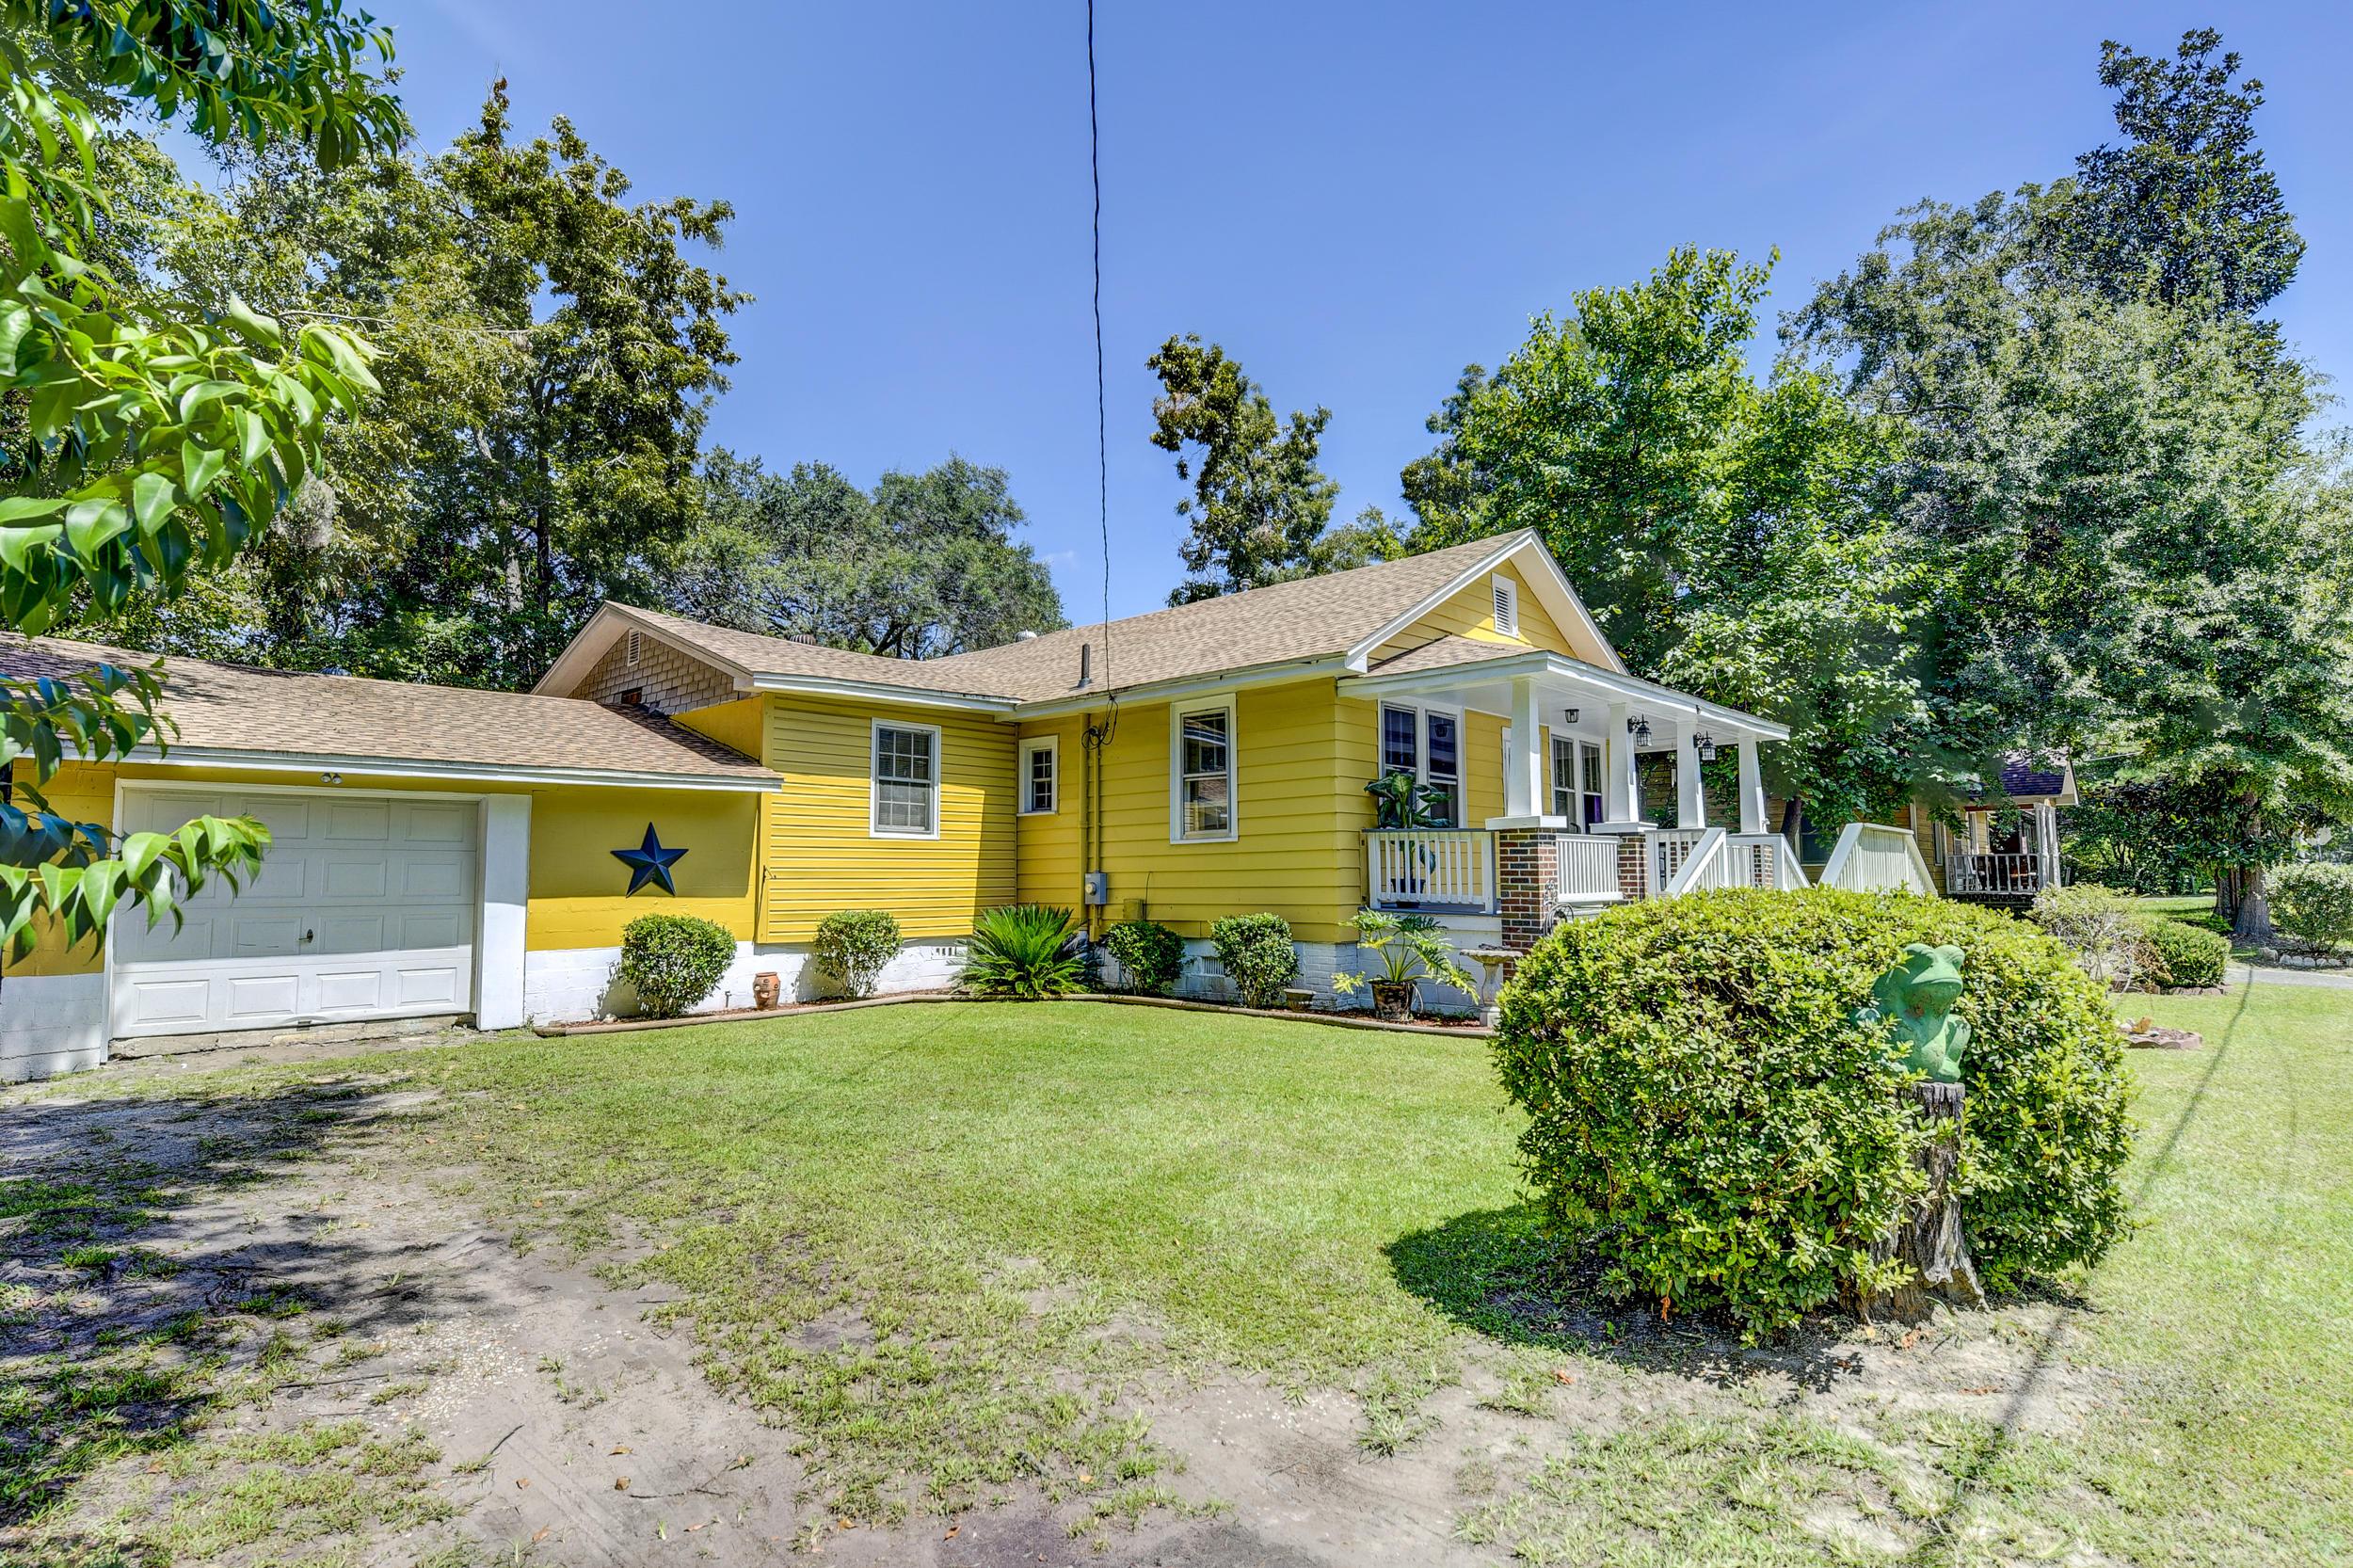 St Andrews Homes For Sale - 1908 2nd, Charleston, SC - 0